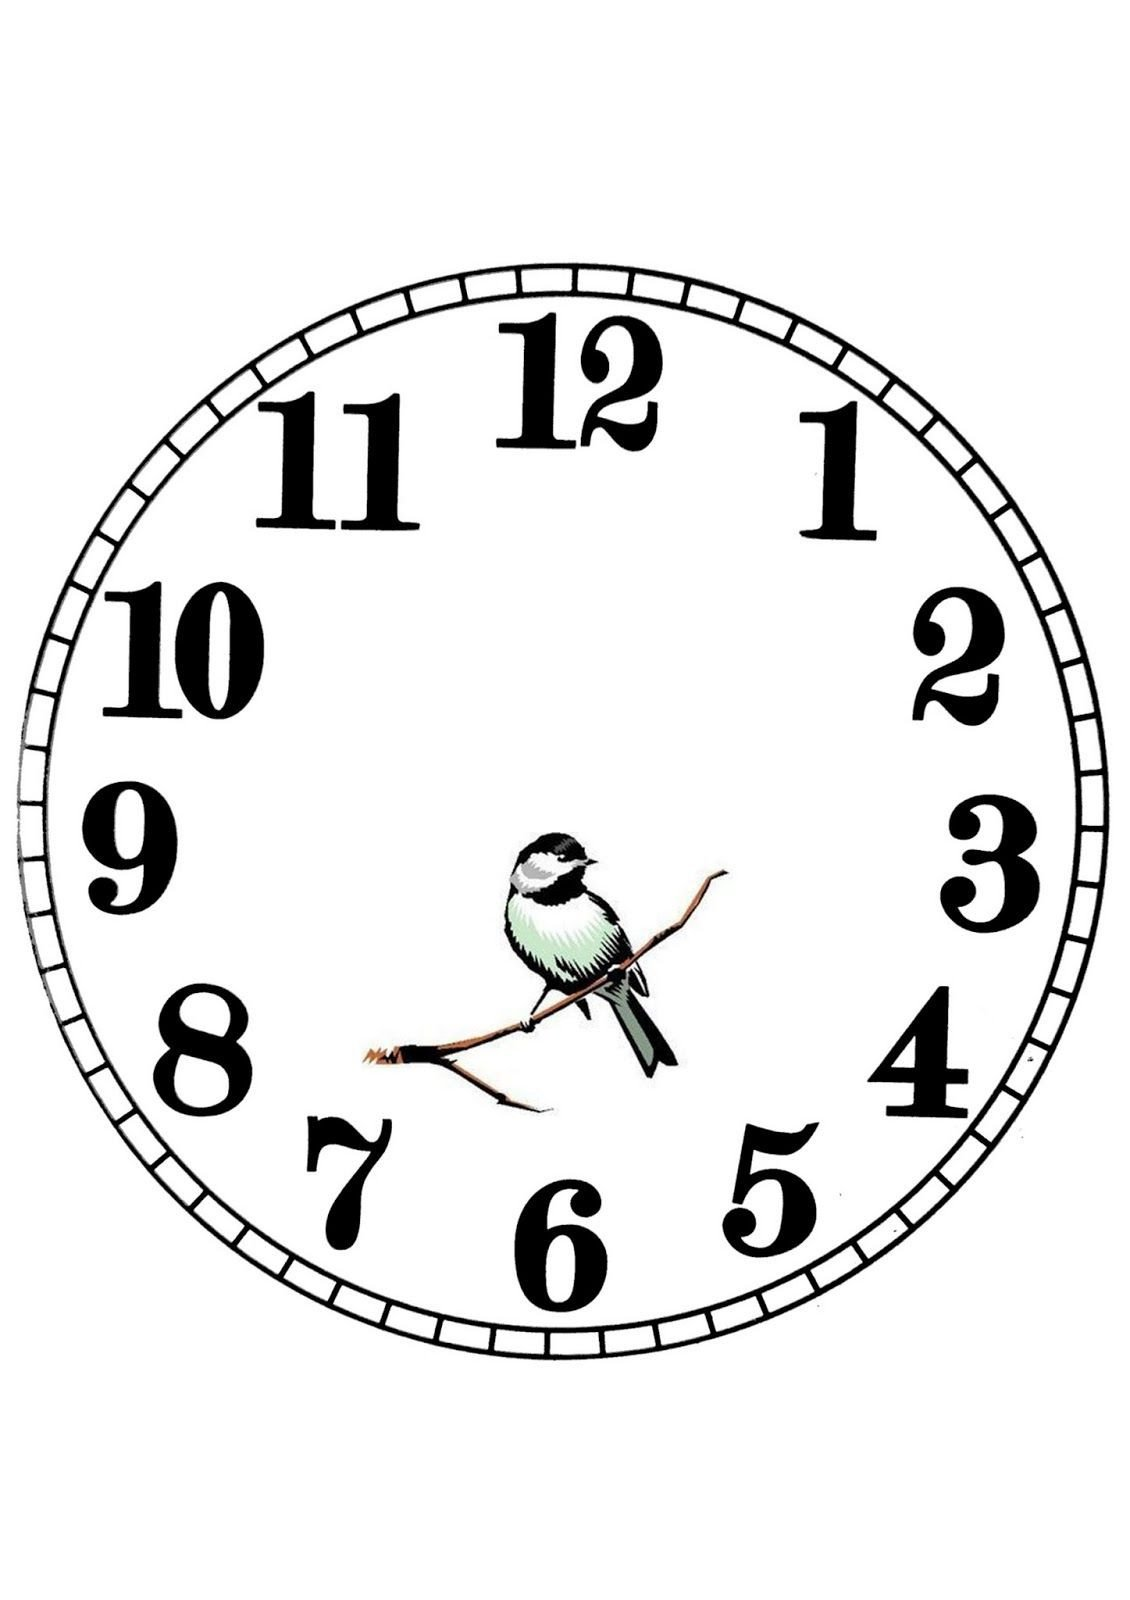 Customizable Clock Face Template Pin De Deirdre P Em Printables Transfers Monotone